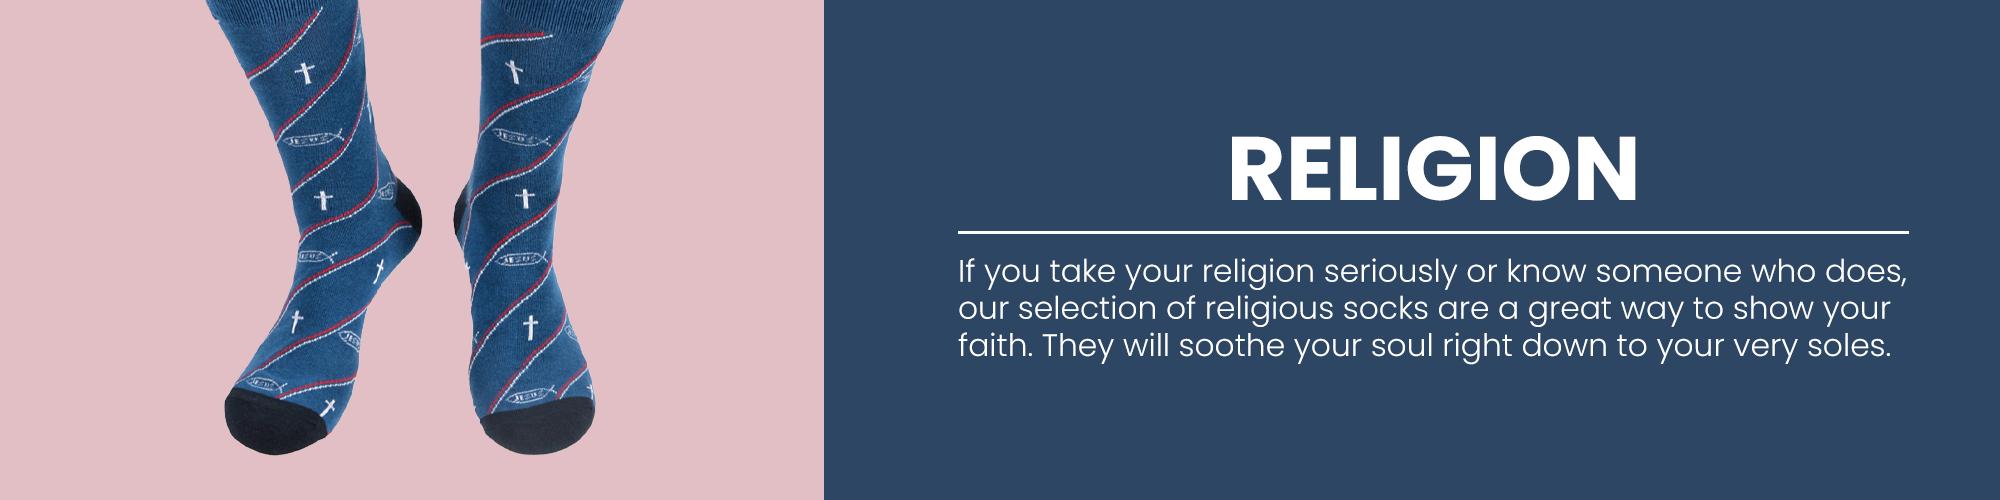 Men's Religion